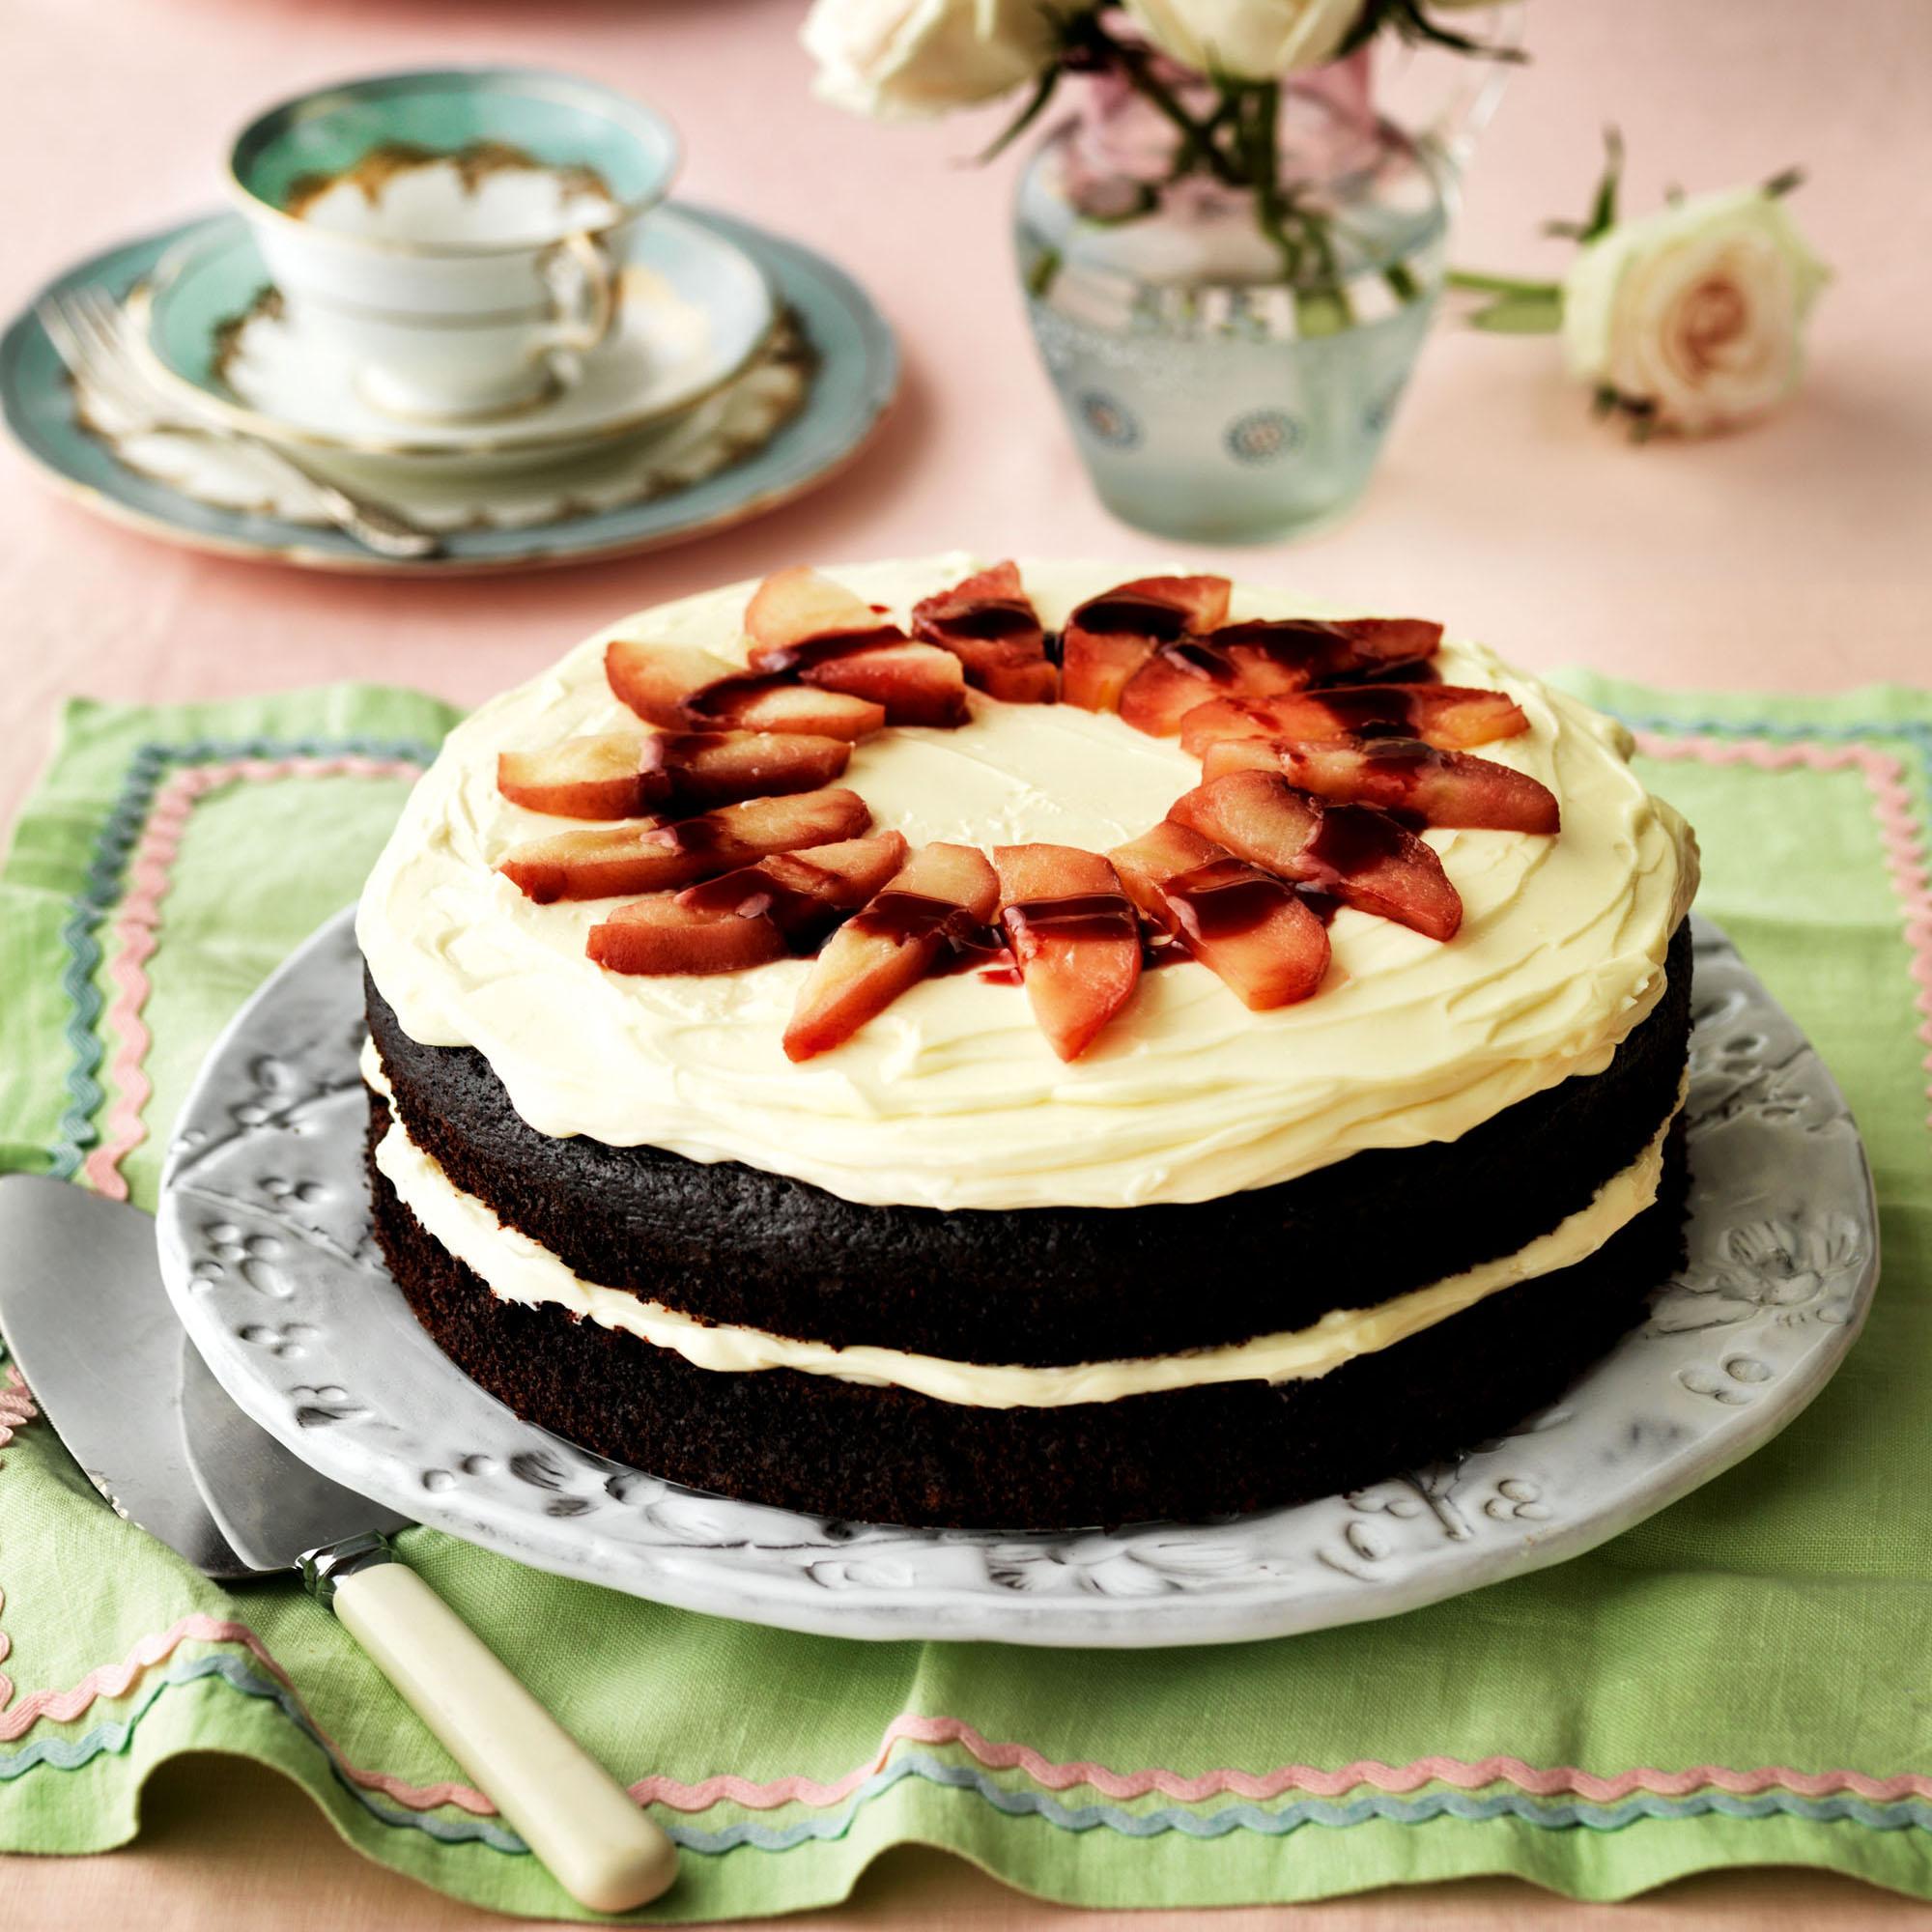 Astonishing Chocolate Guinness Cake Dessert Recipes Womanhome Birthday Cards Printable Benkemecafe Filternl